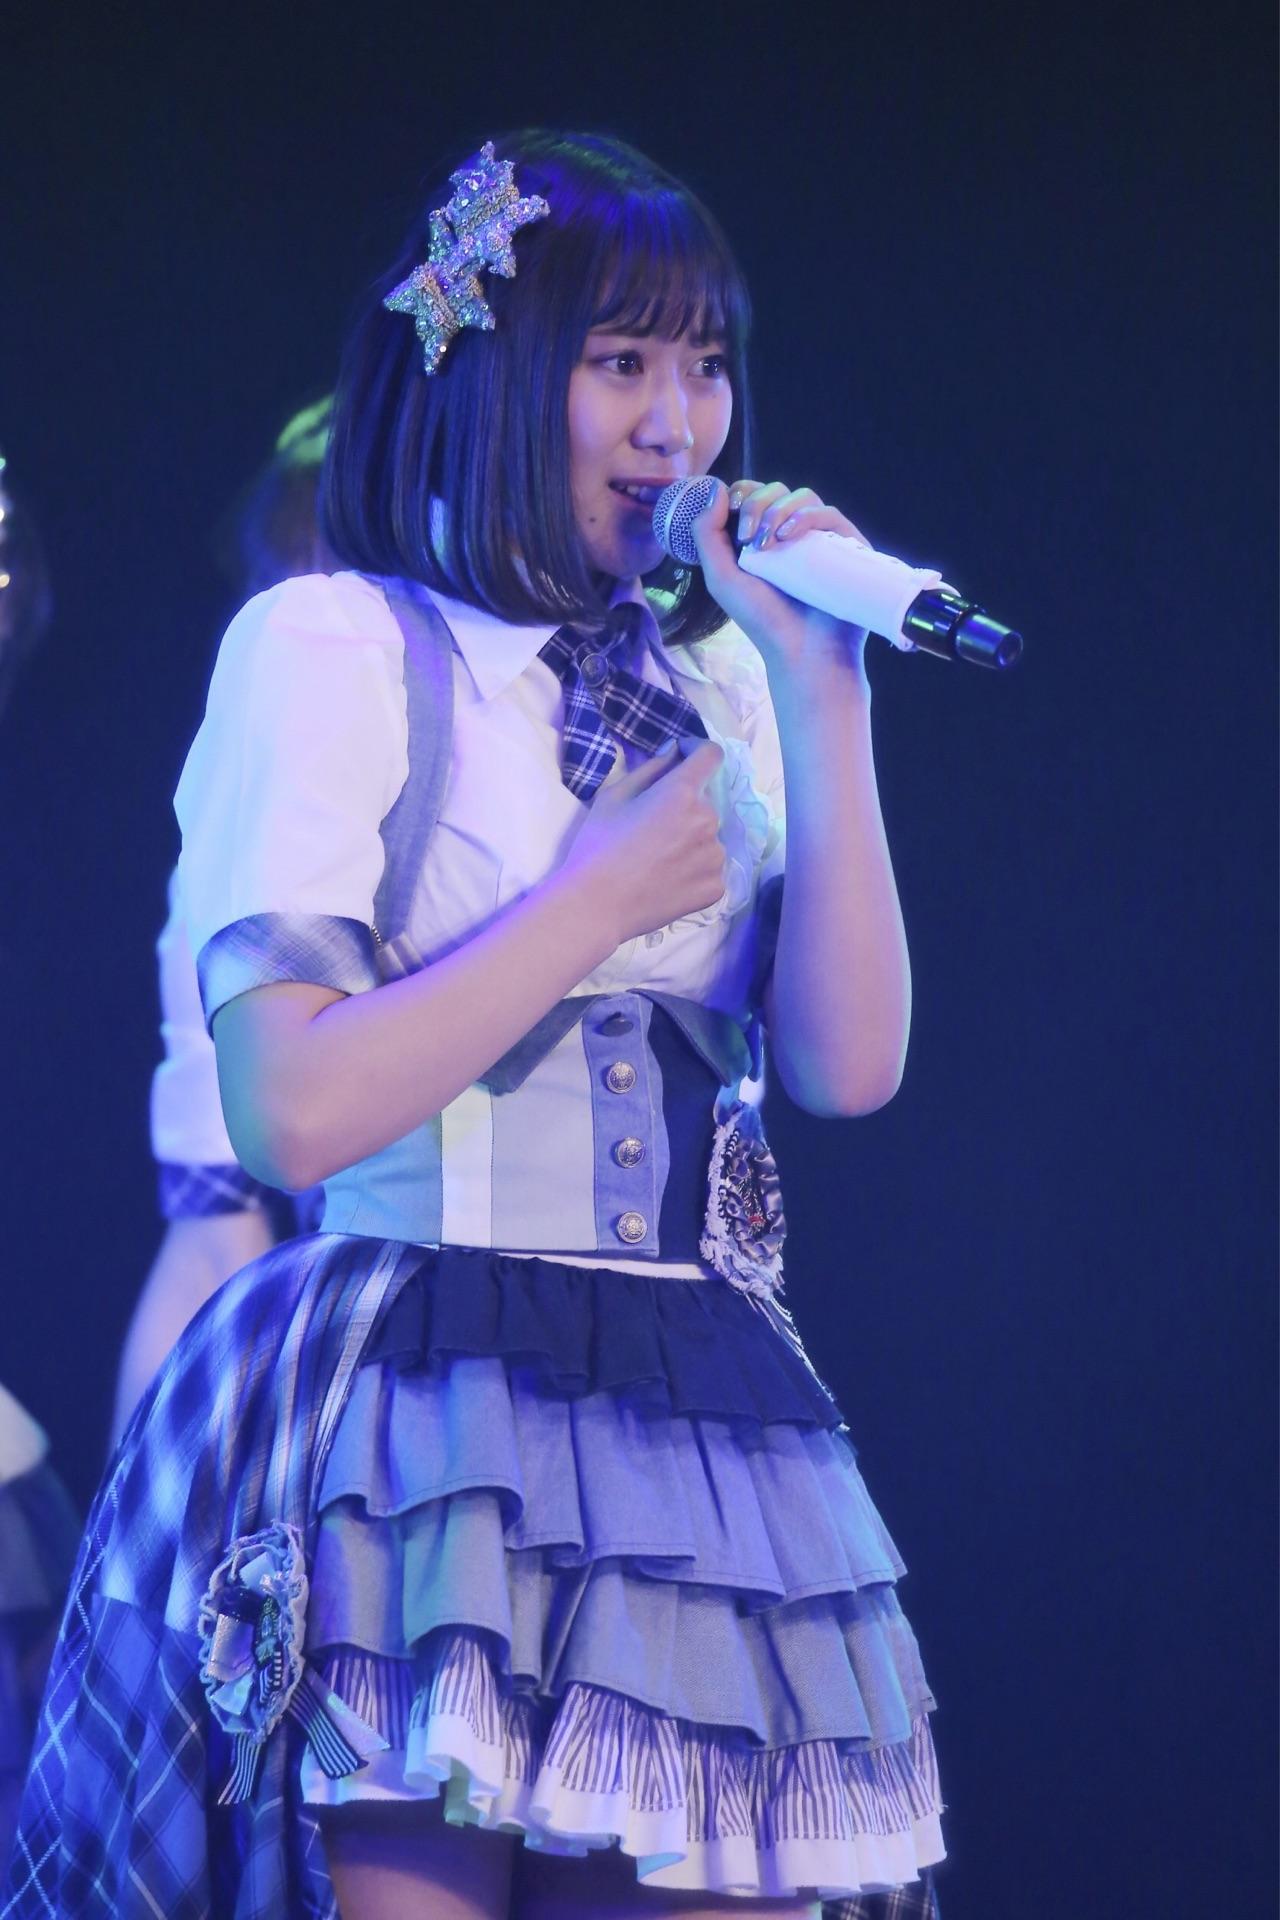 【SKE48】井田玲音名ちゃん応援スレ【チームE・れおな】8 YouTube動画>41本 ->画像>497枚